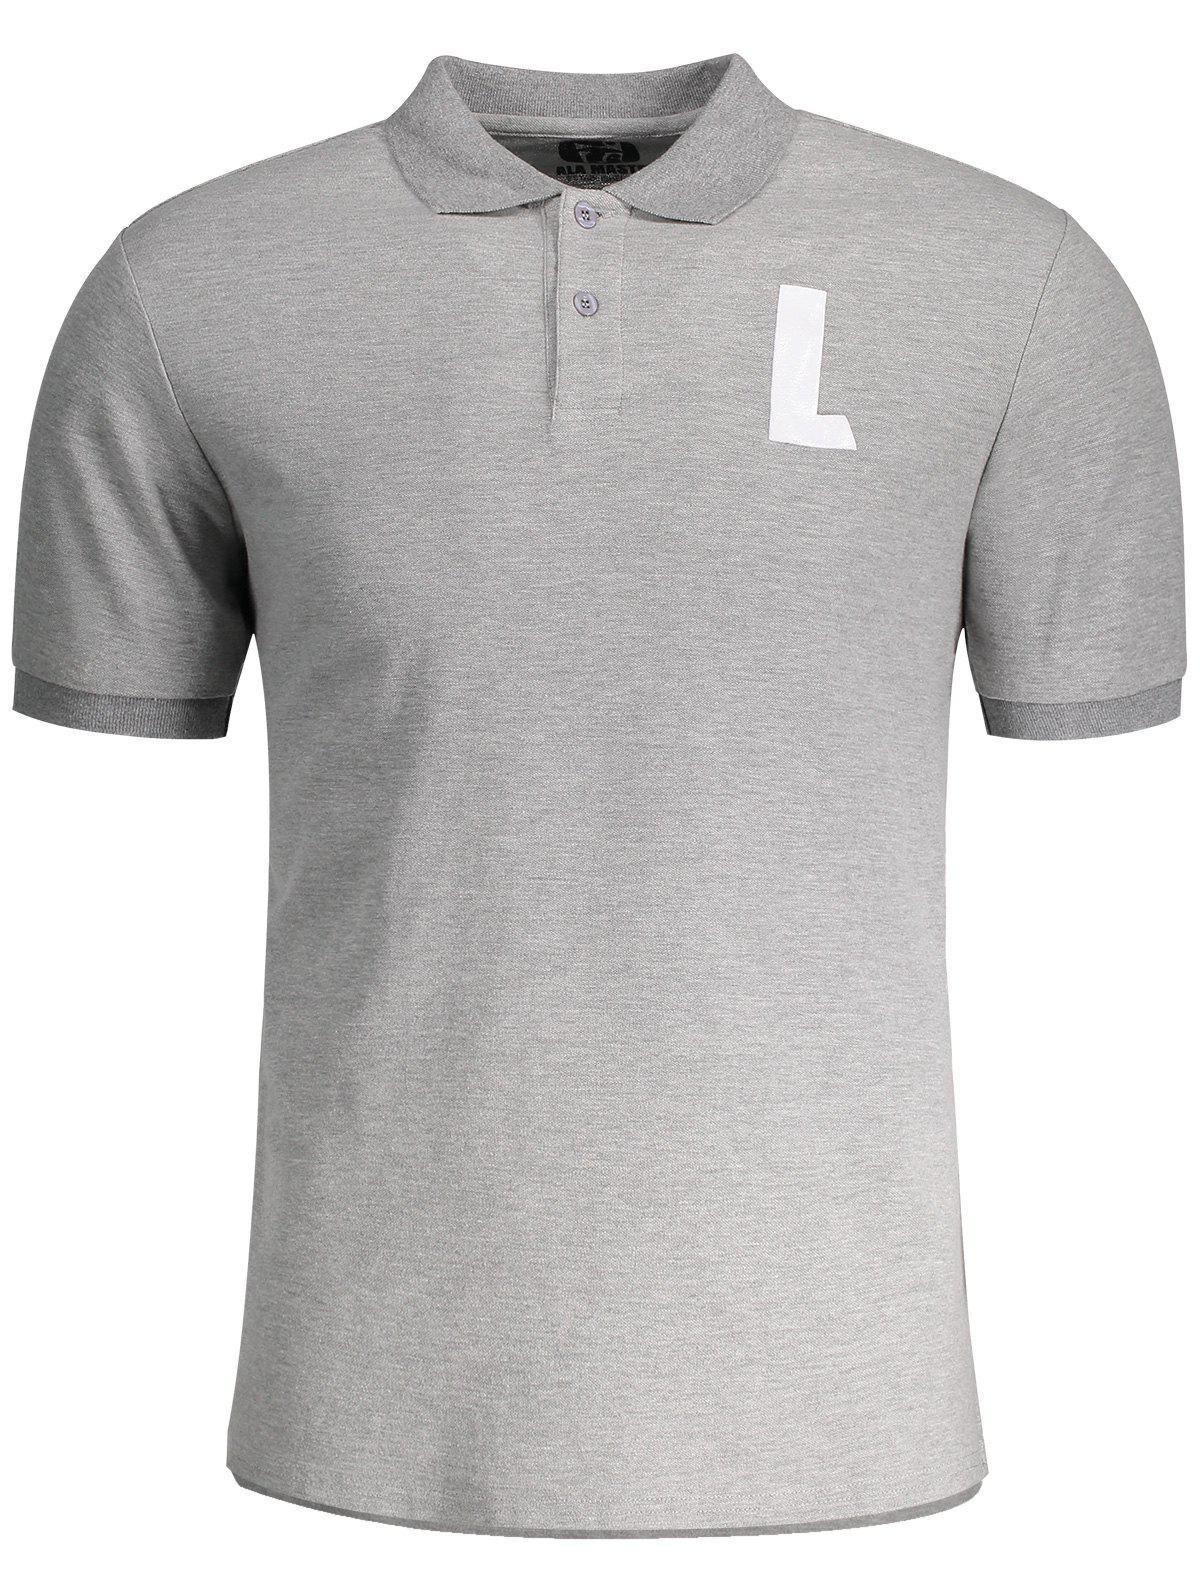 Shirt Neck L Pattern Short Sleeve Tee 218656201